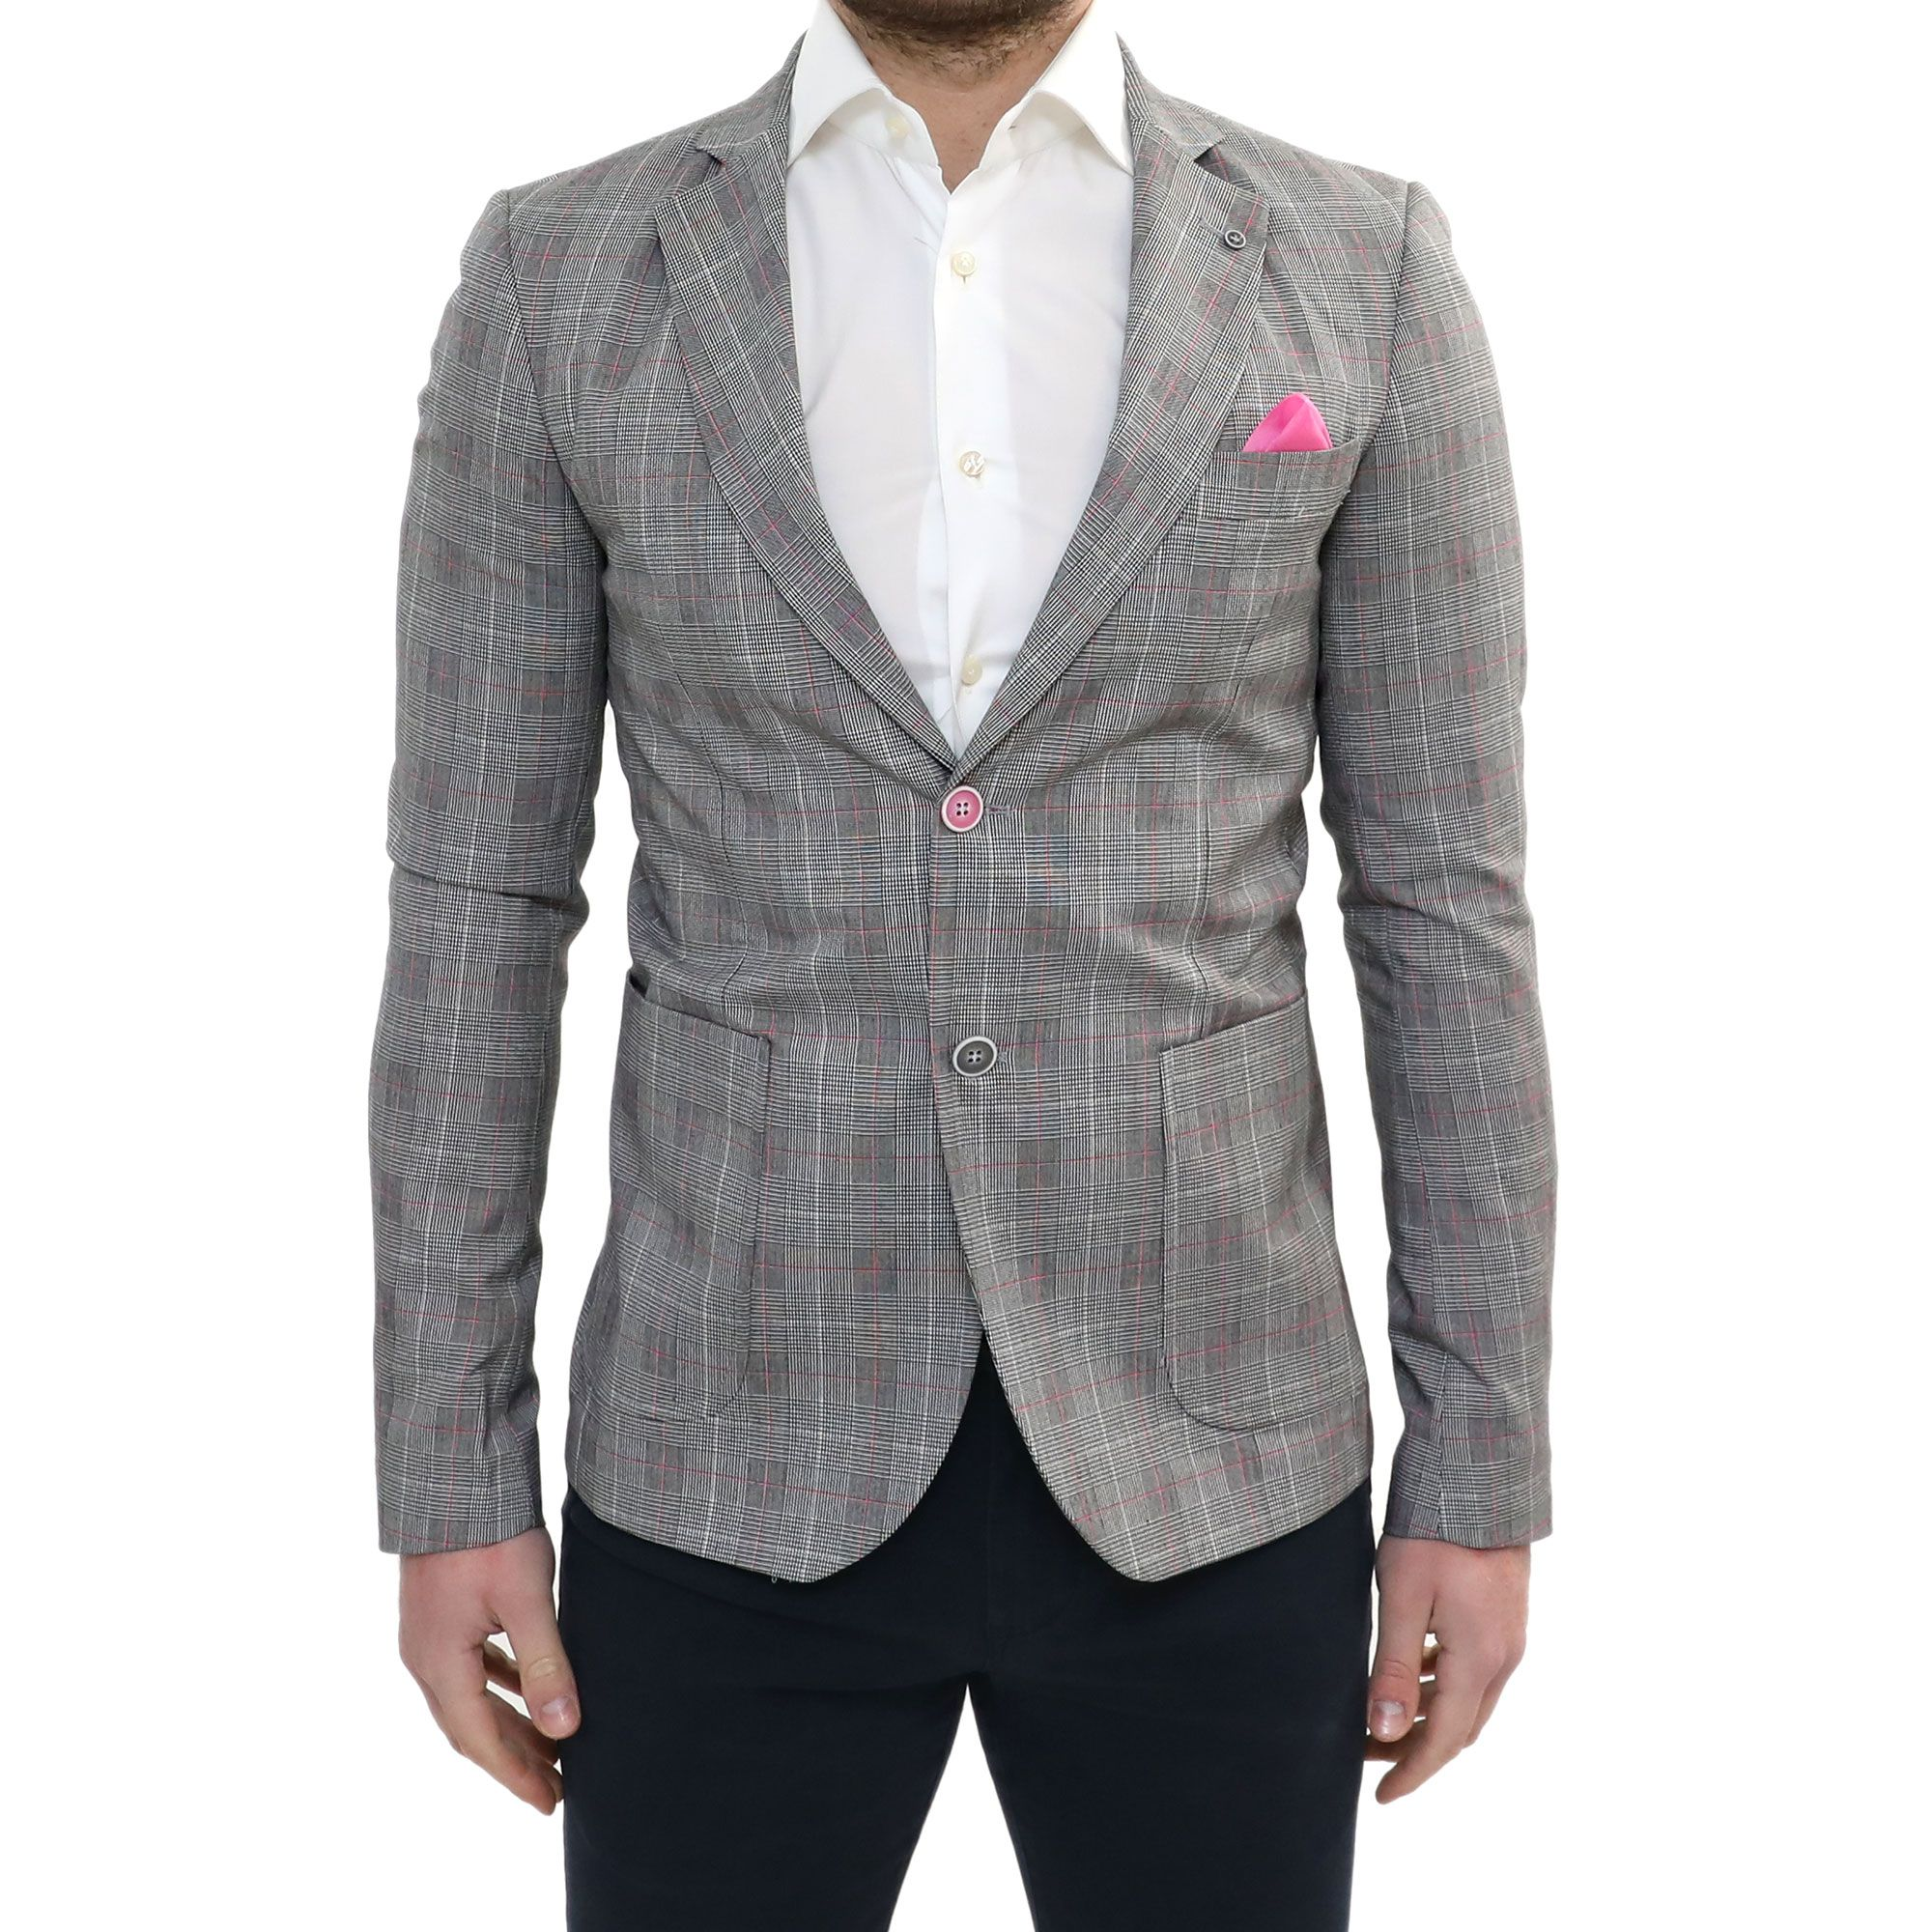 Giacca Uomo Sartoriale Bordeaux Slim Fit casual elegante